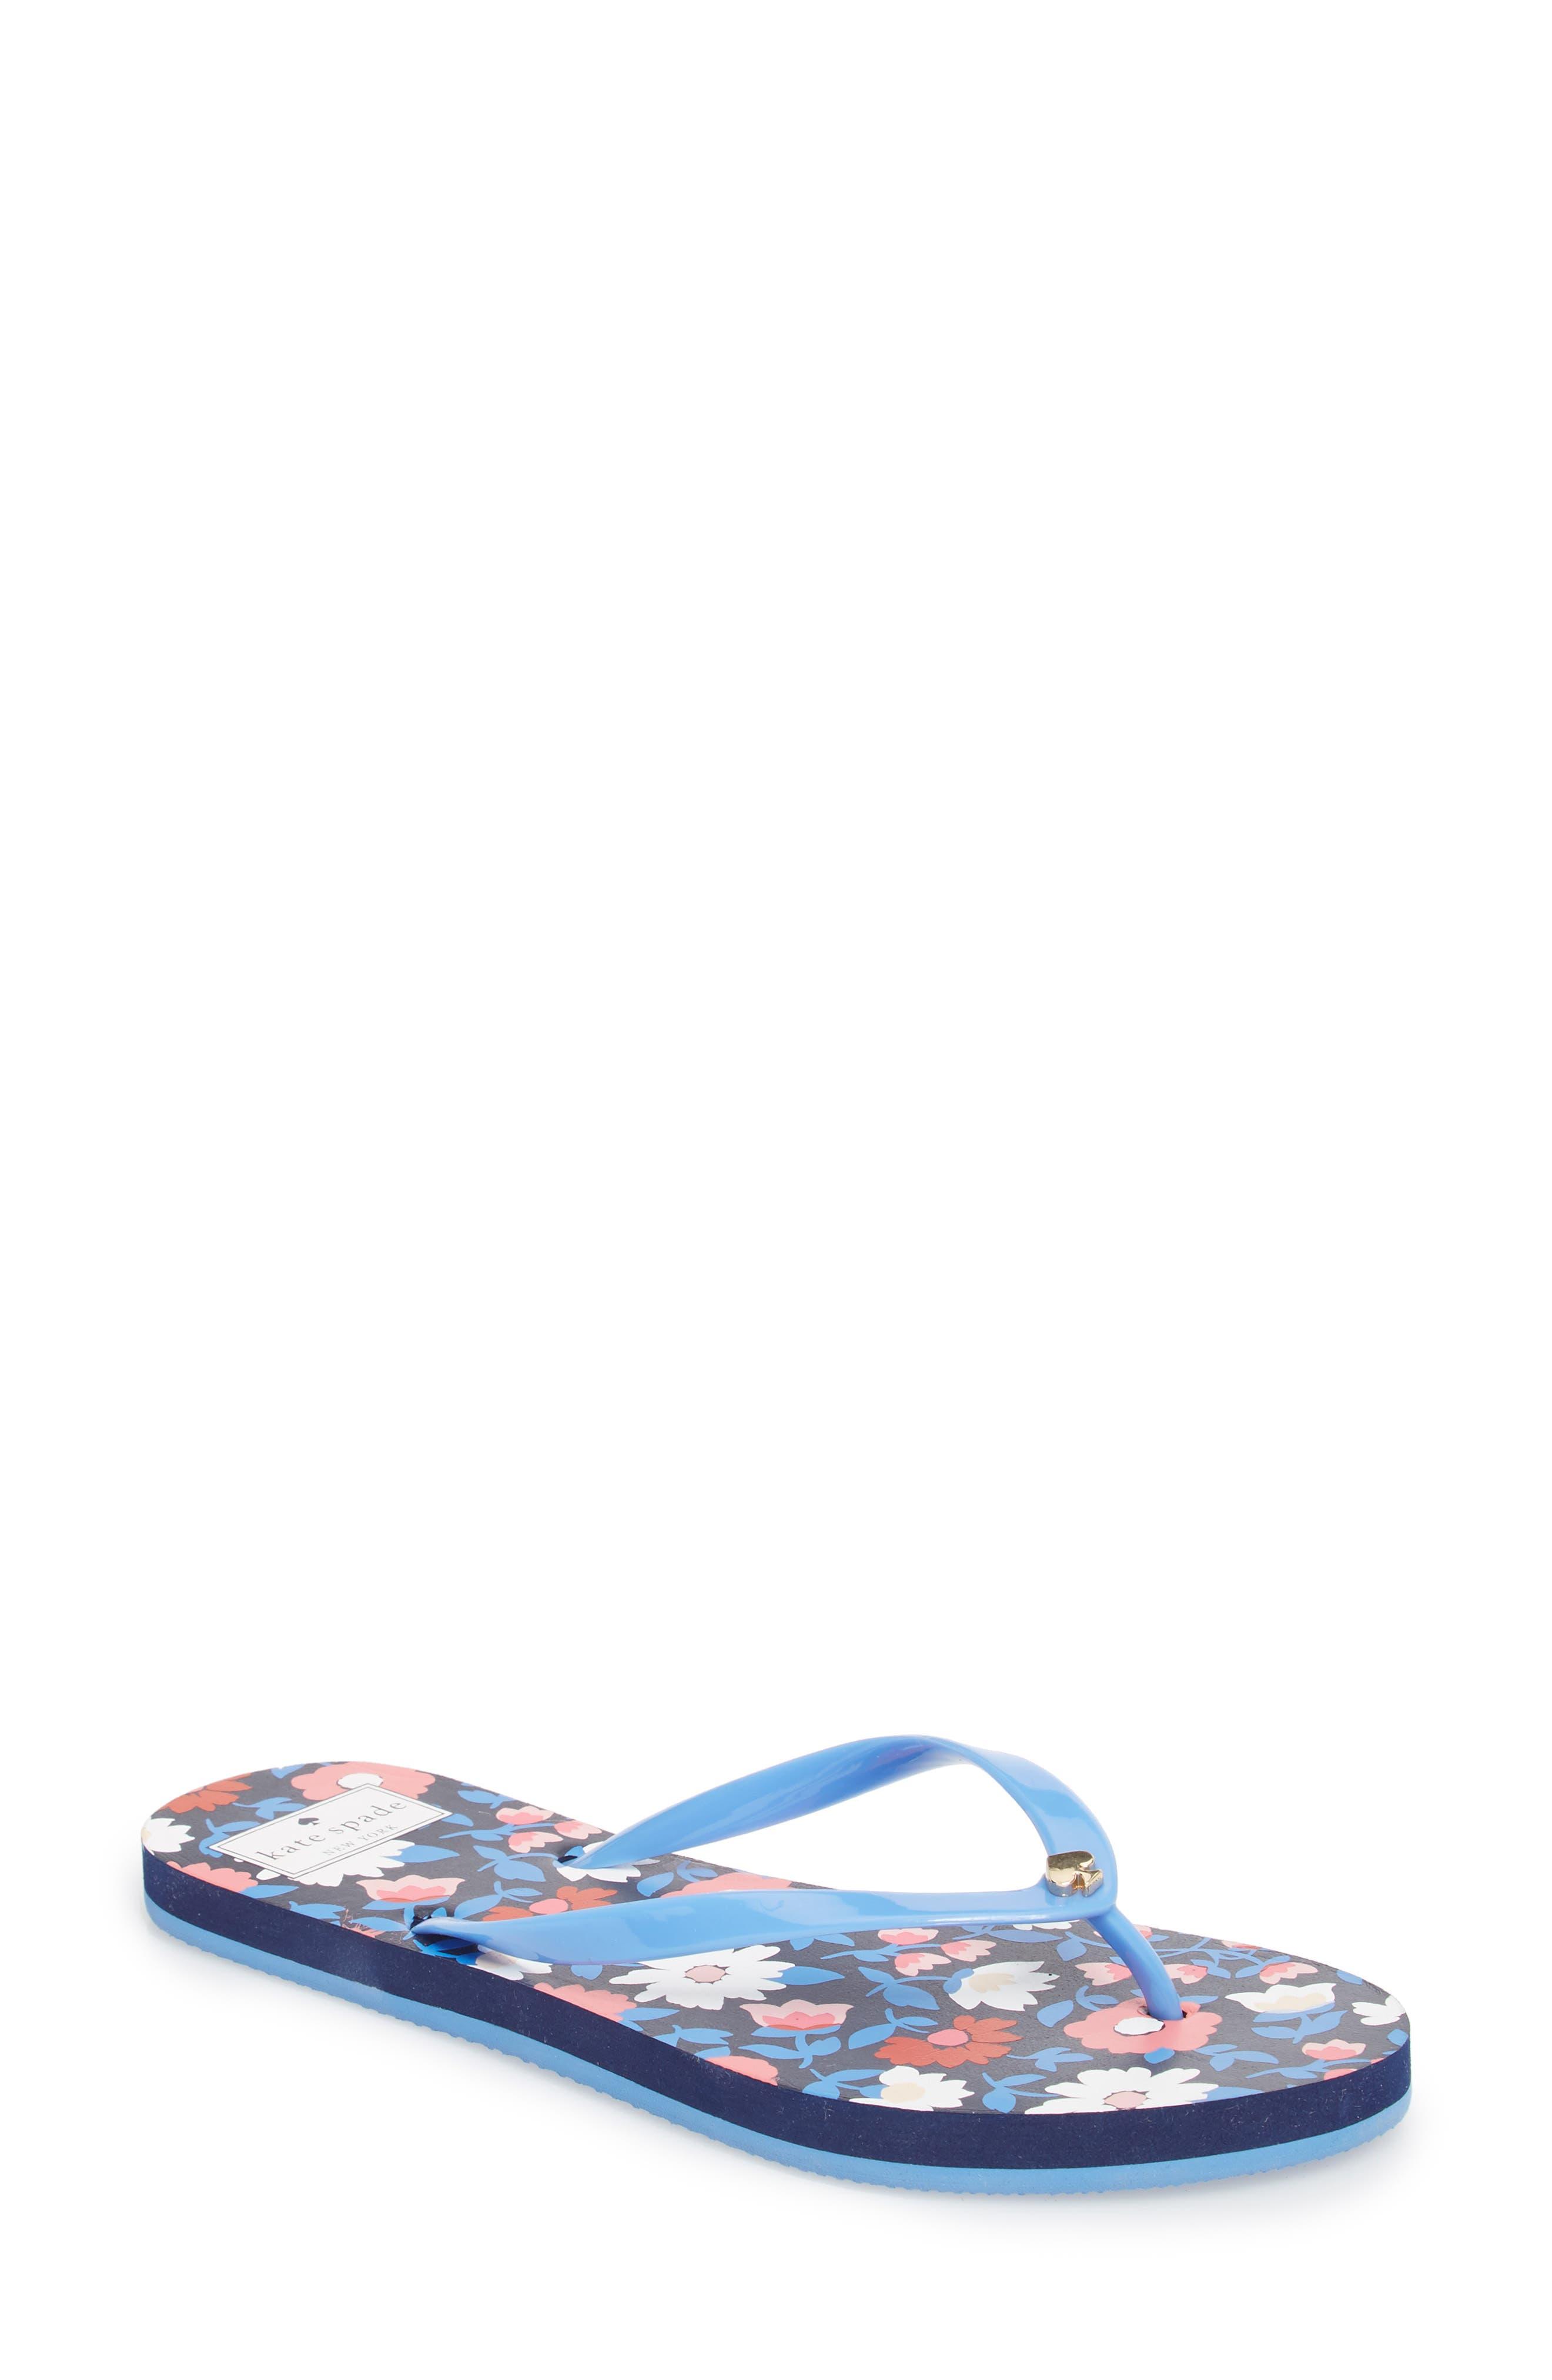 Main Image - kate spade new york 'nassau' flip flop (Women)